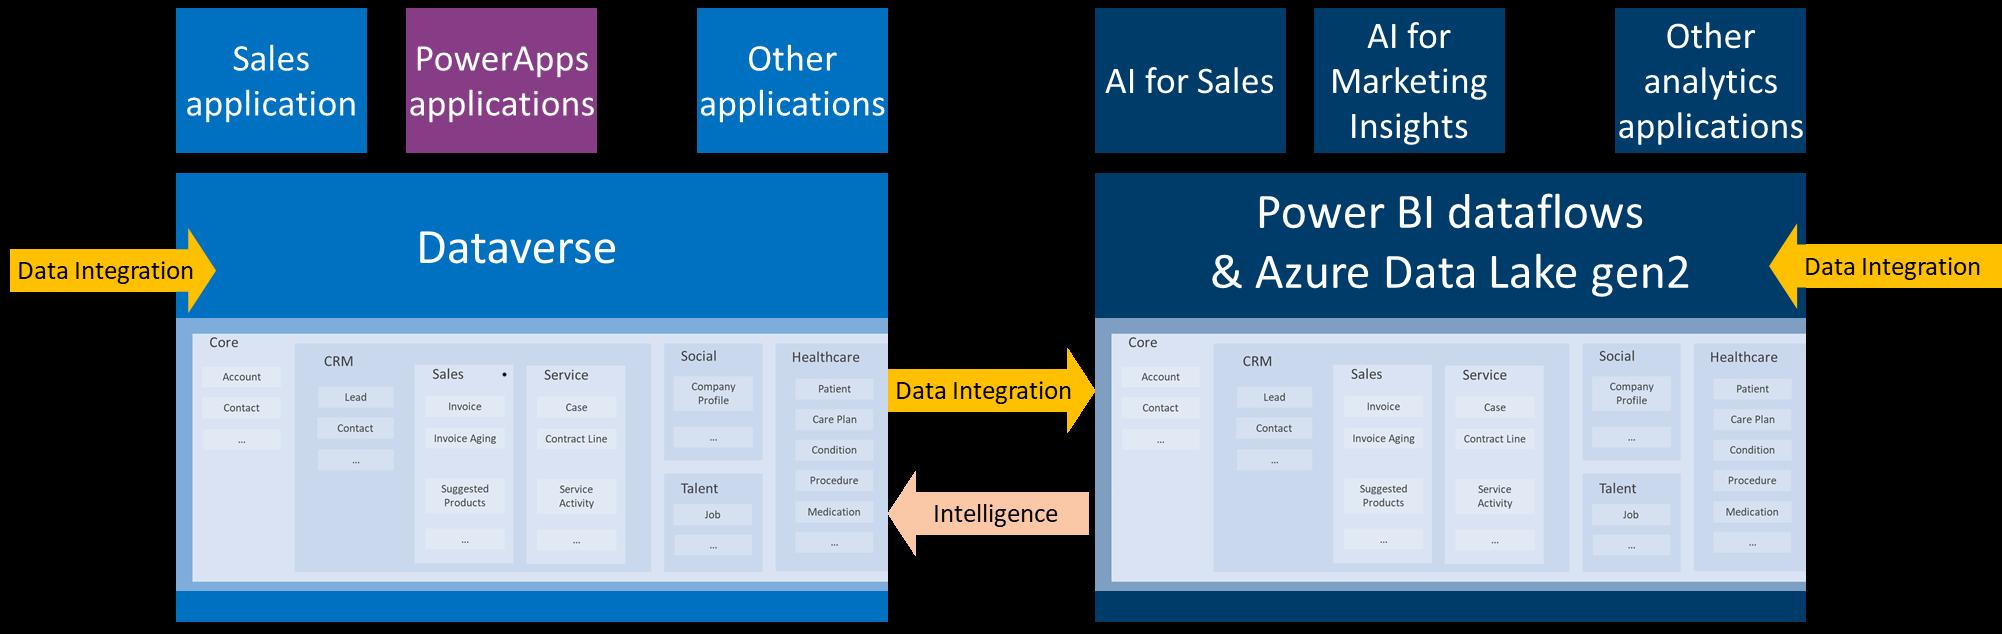 Usage - Common Data Model - Common Data Model | Microsoft Docs